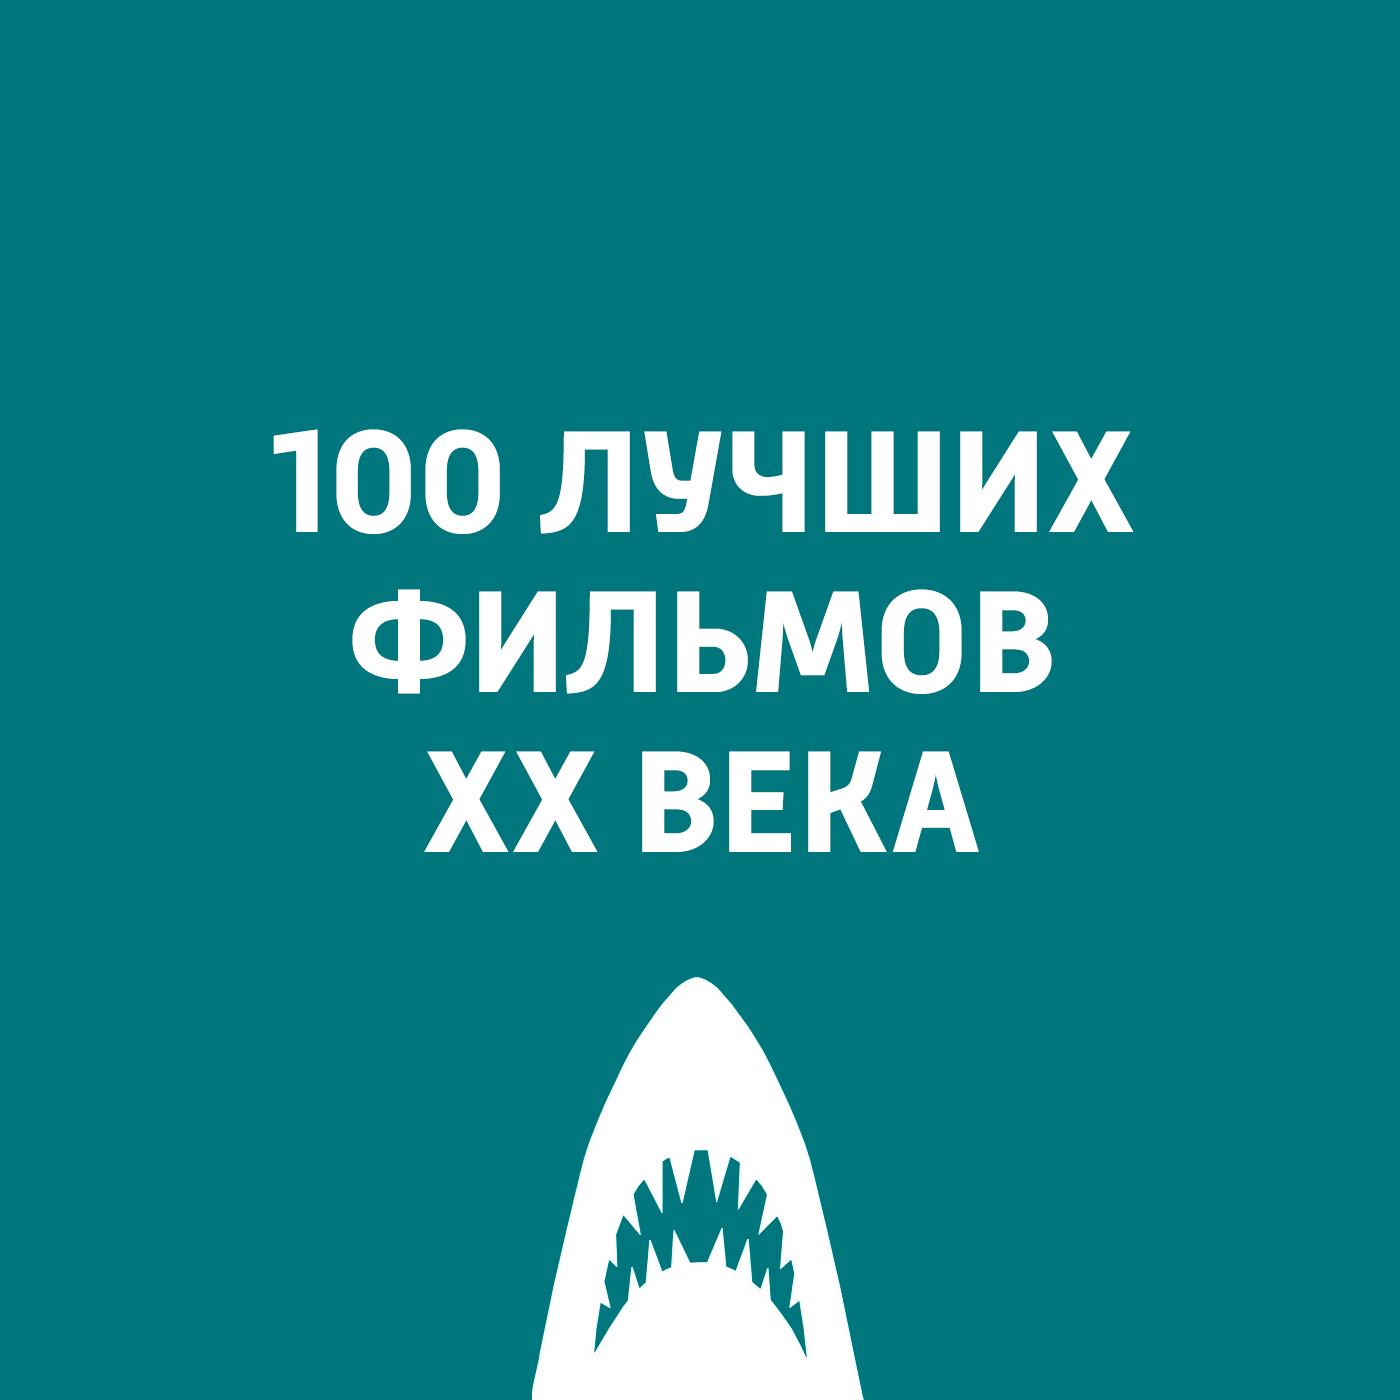 Антон Долин Криминальное чтиво